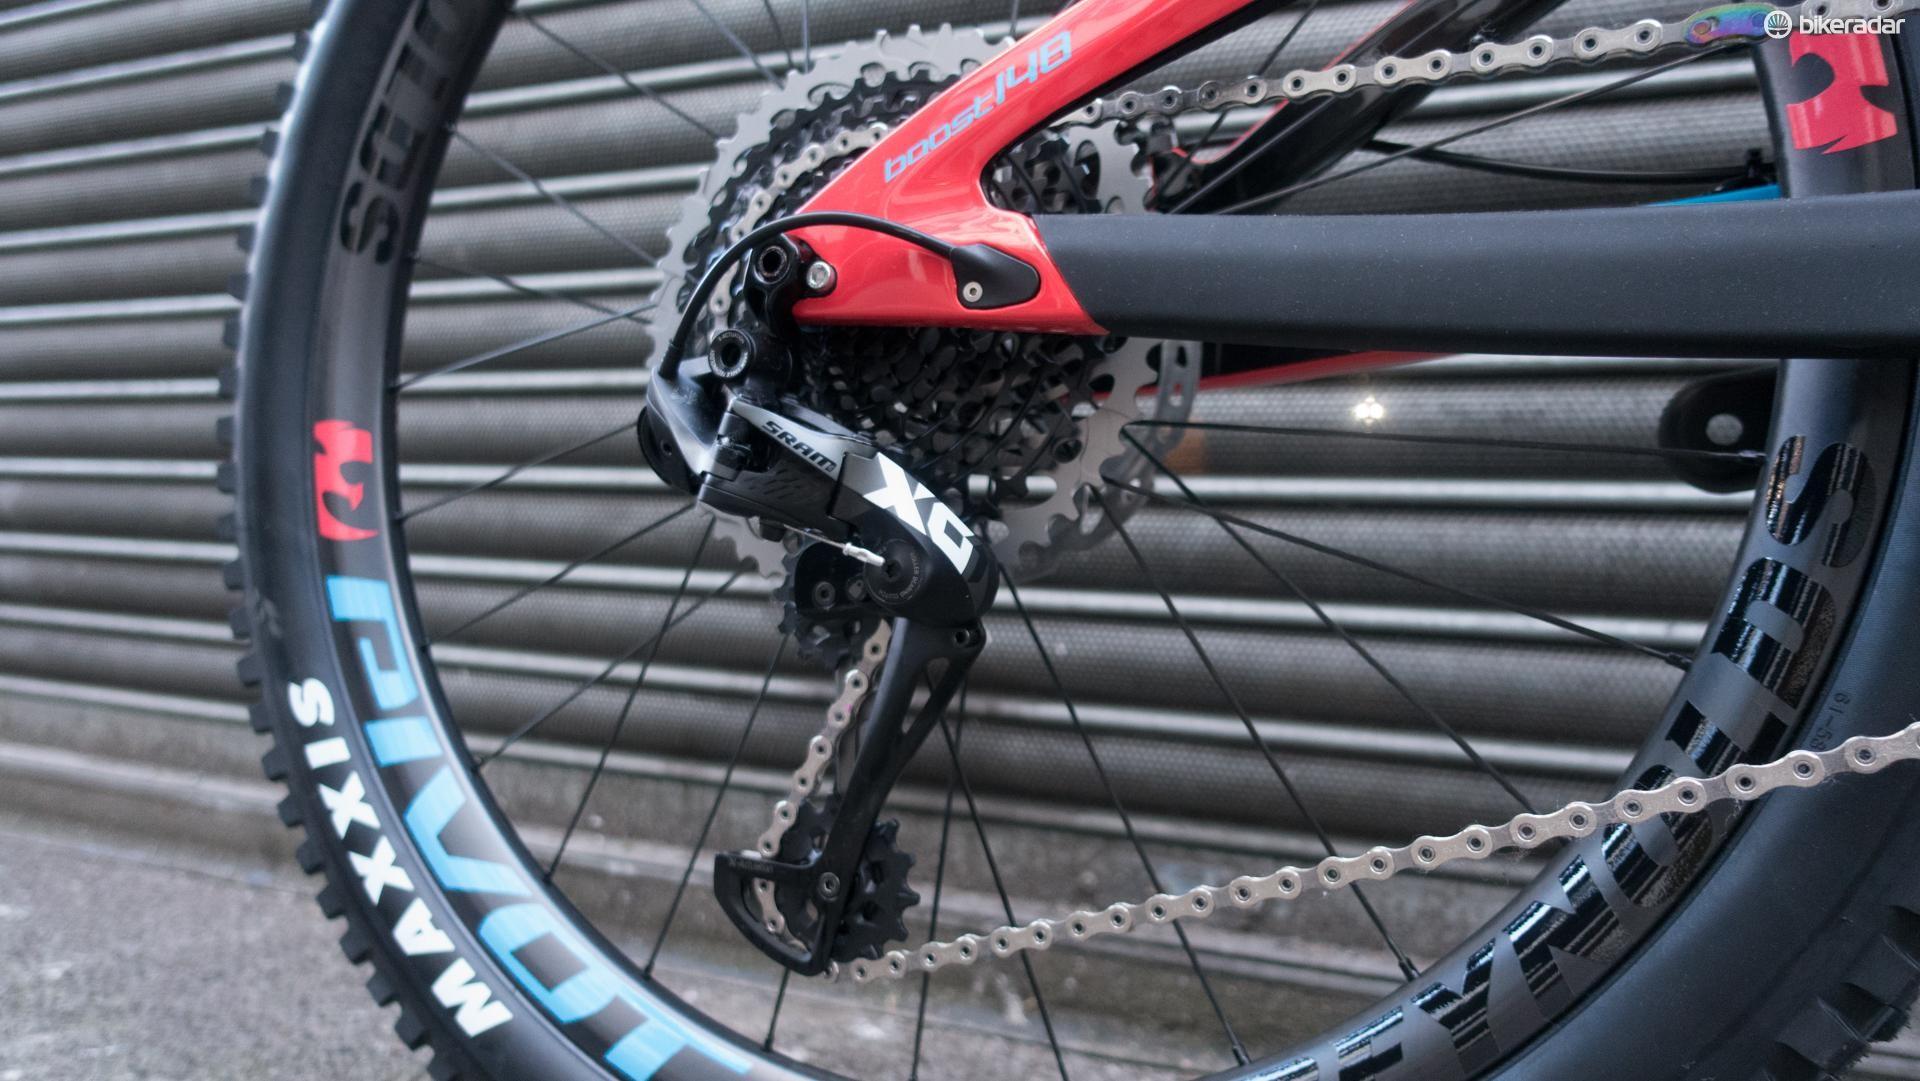 SRAM's new X01 Eagle should help you up those climbs